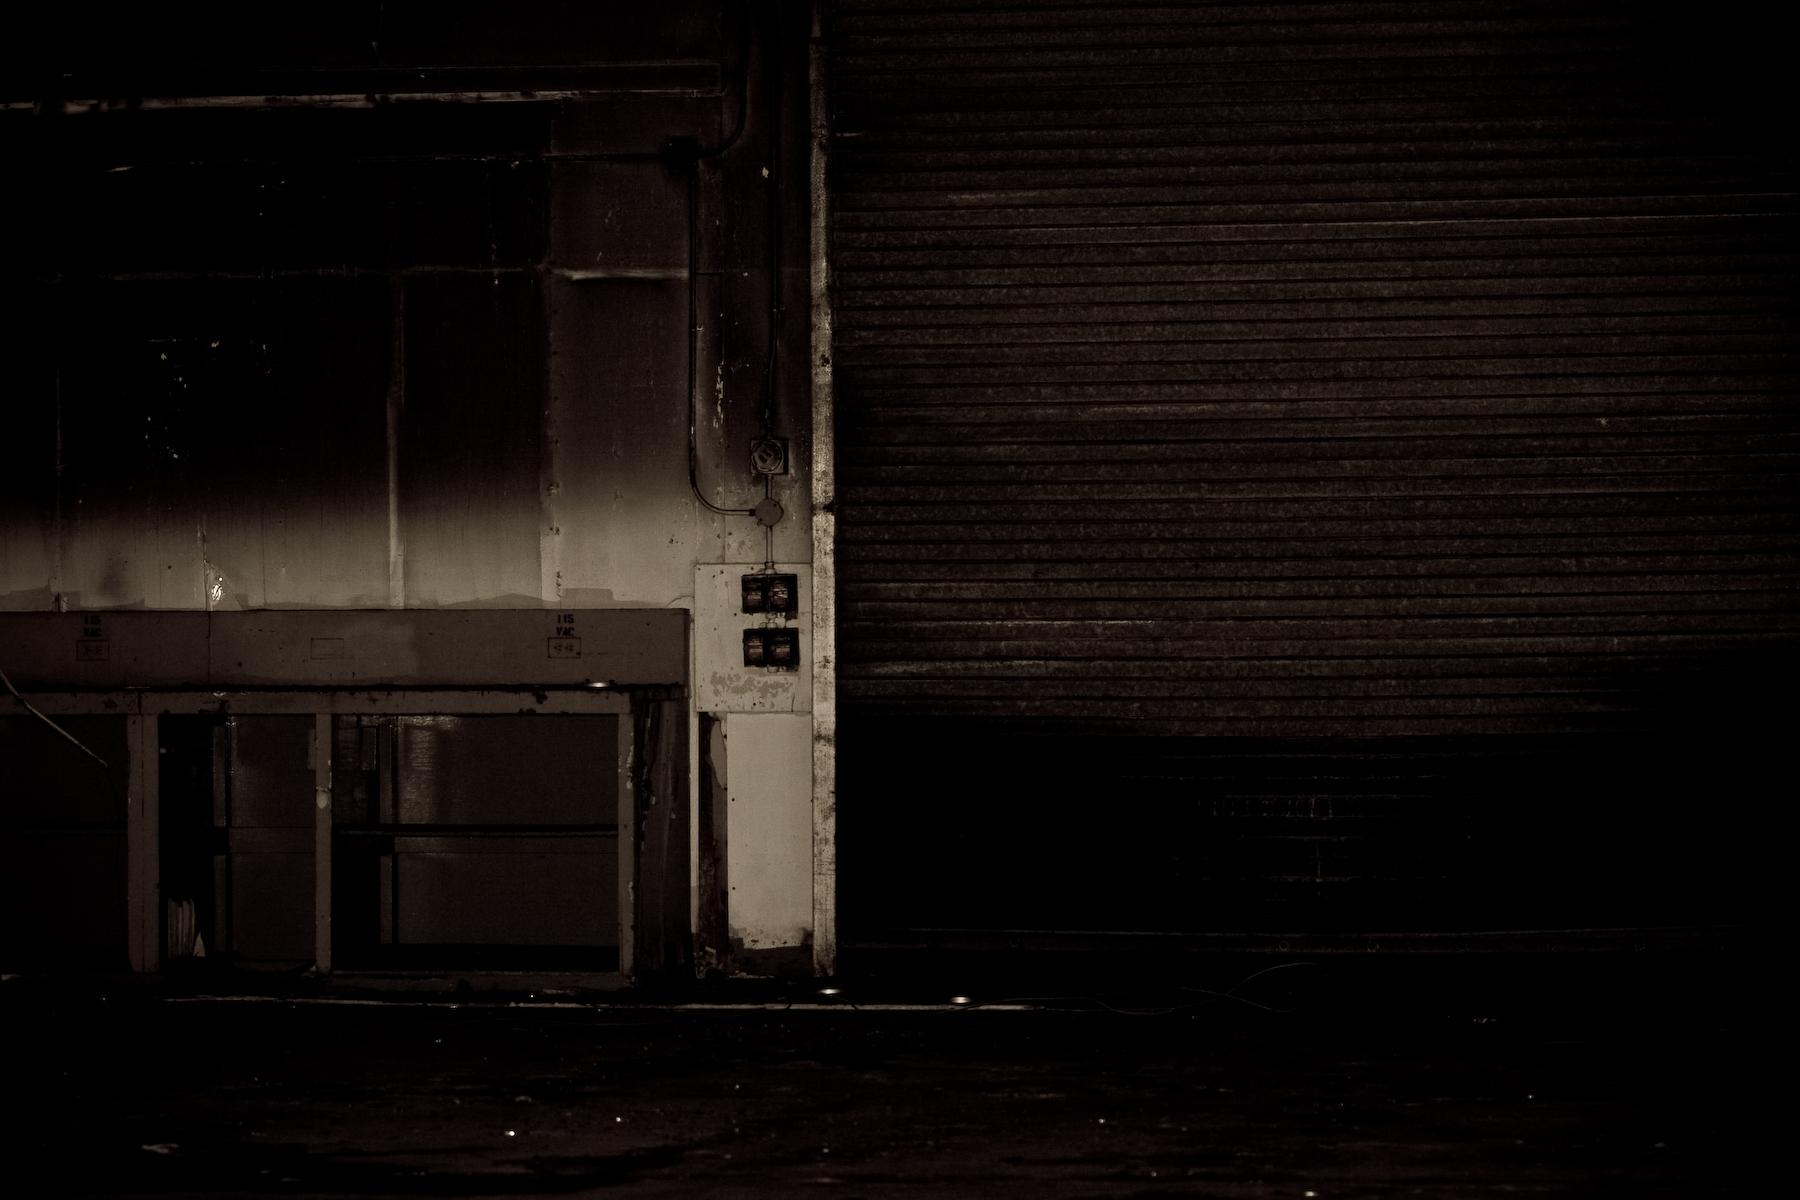 Abandoned warehouse, Abandoned, Building, Dark, Doors, HQ Photo